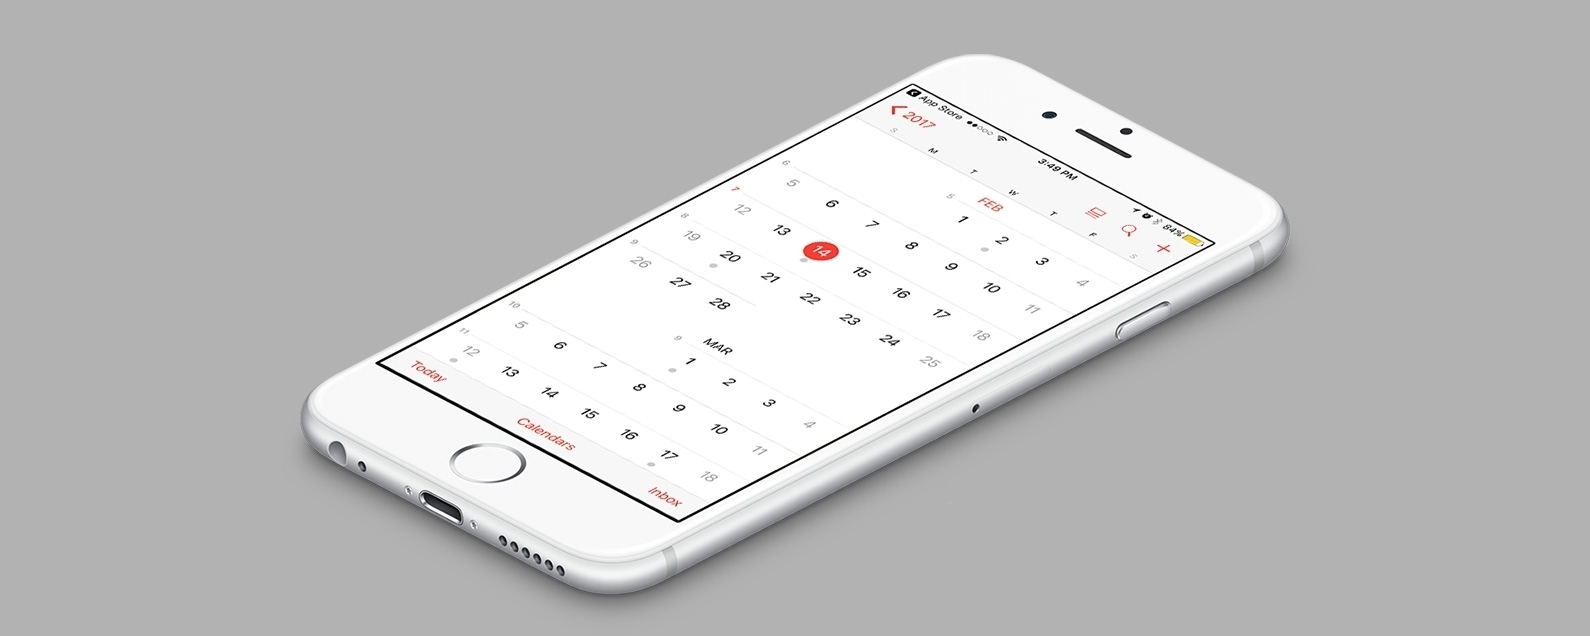 1 Week Calendar Pdf | Igotlockedout